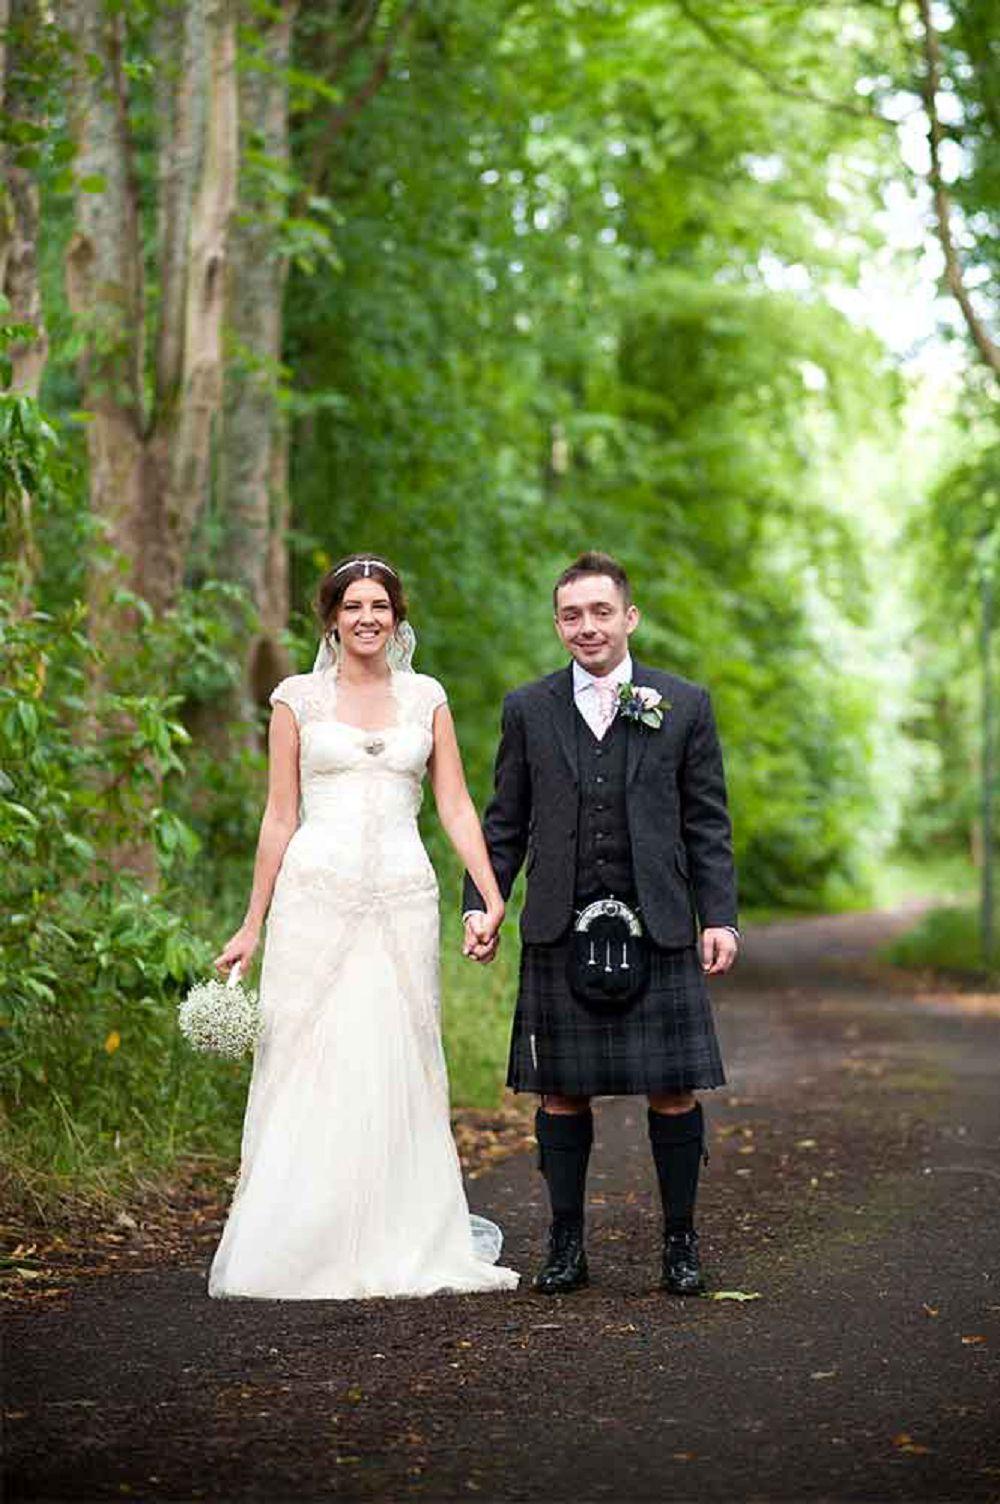 Carnbooth-Wedding-Photographer-BK-Photography-Glasgow